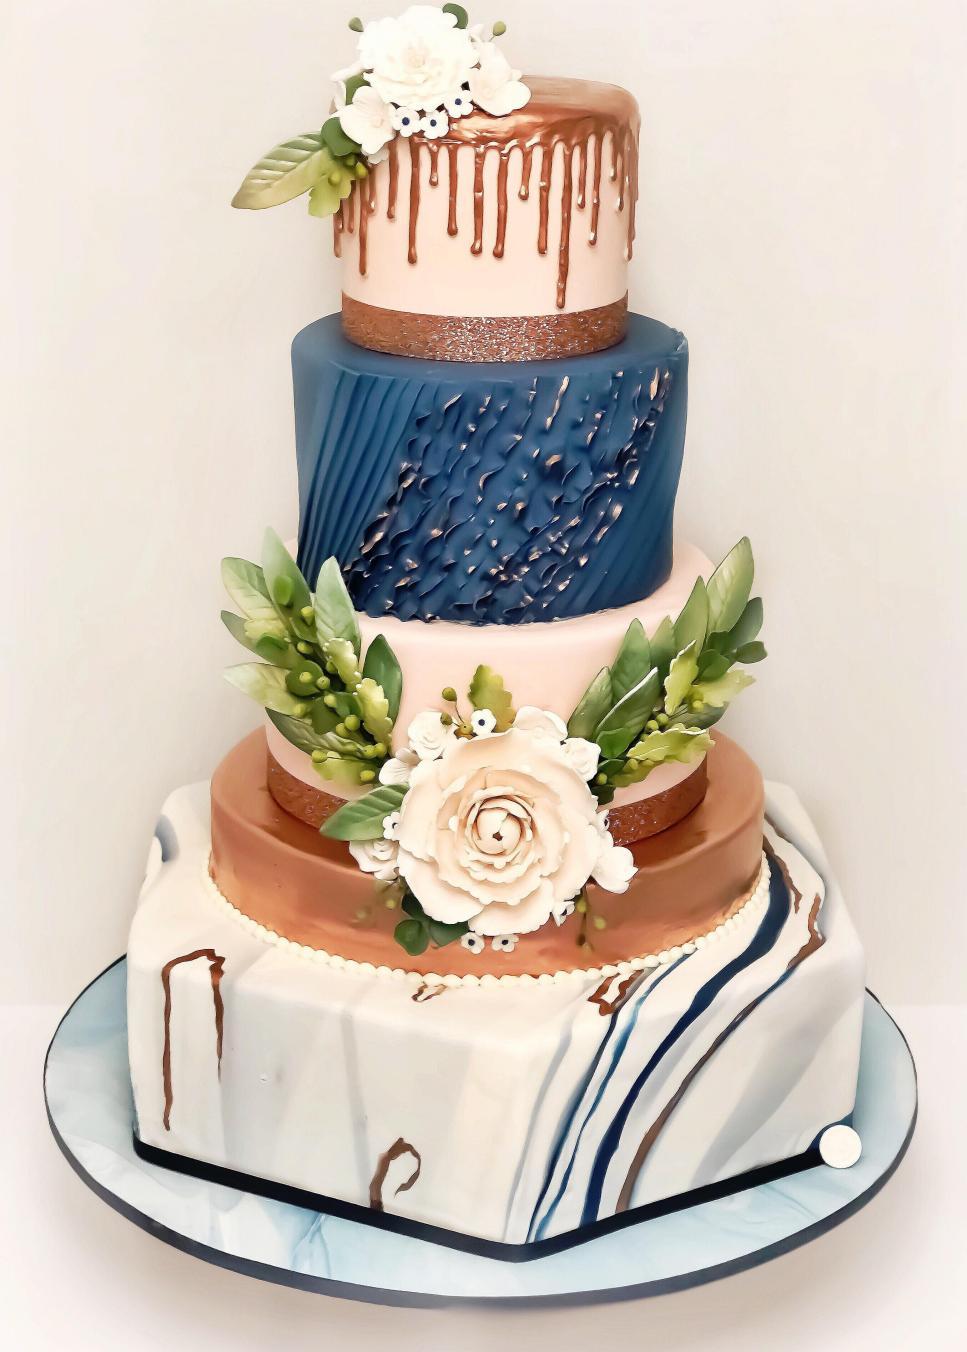 New Wedding Cake Trends In 2019 Weddings Tlc Com